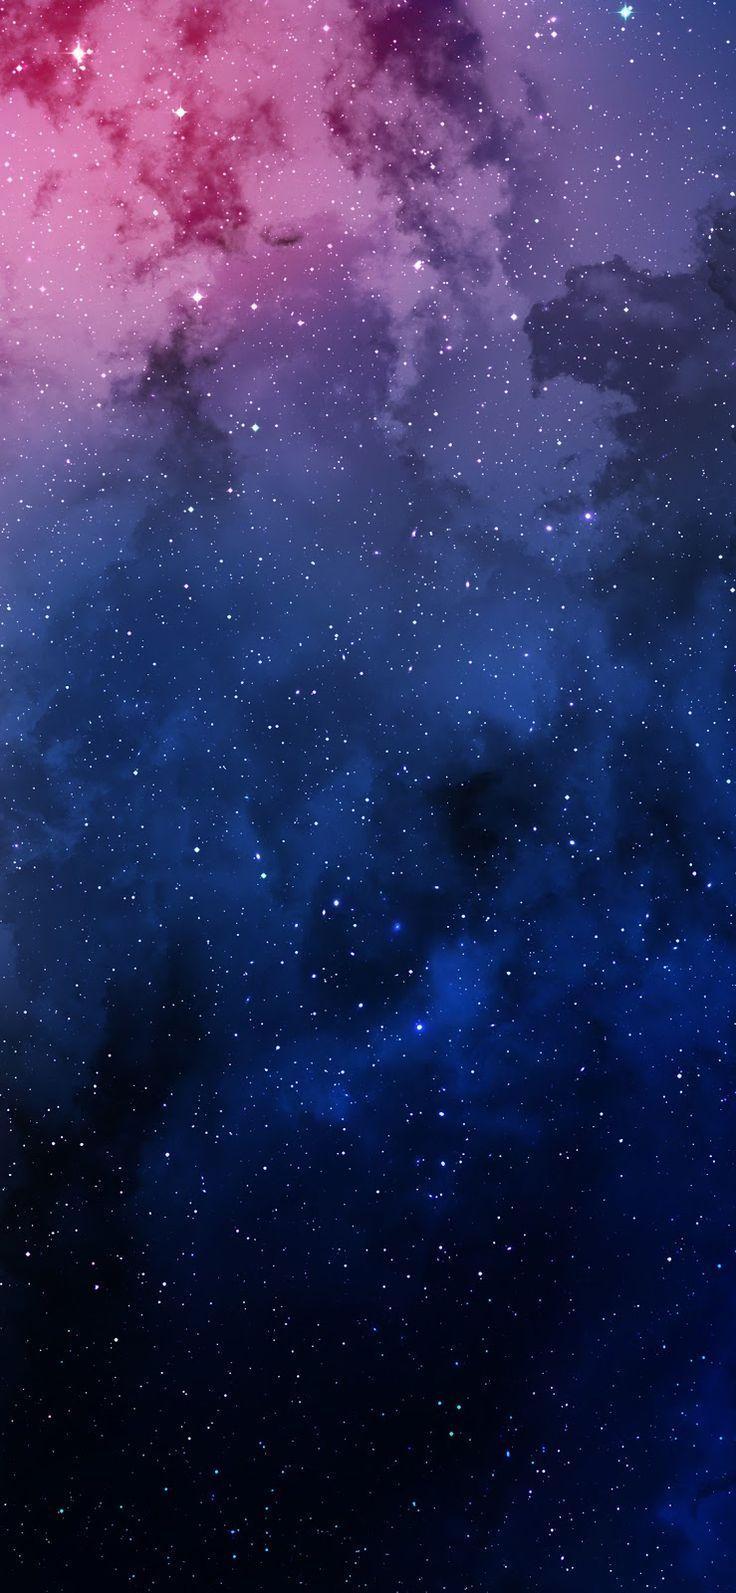 Galaxy Space Wallpaper Aesthetic Novocom Top